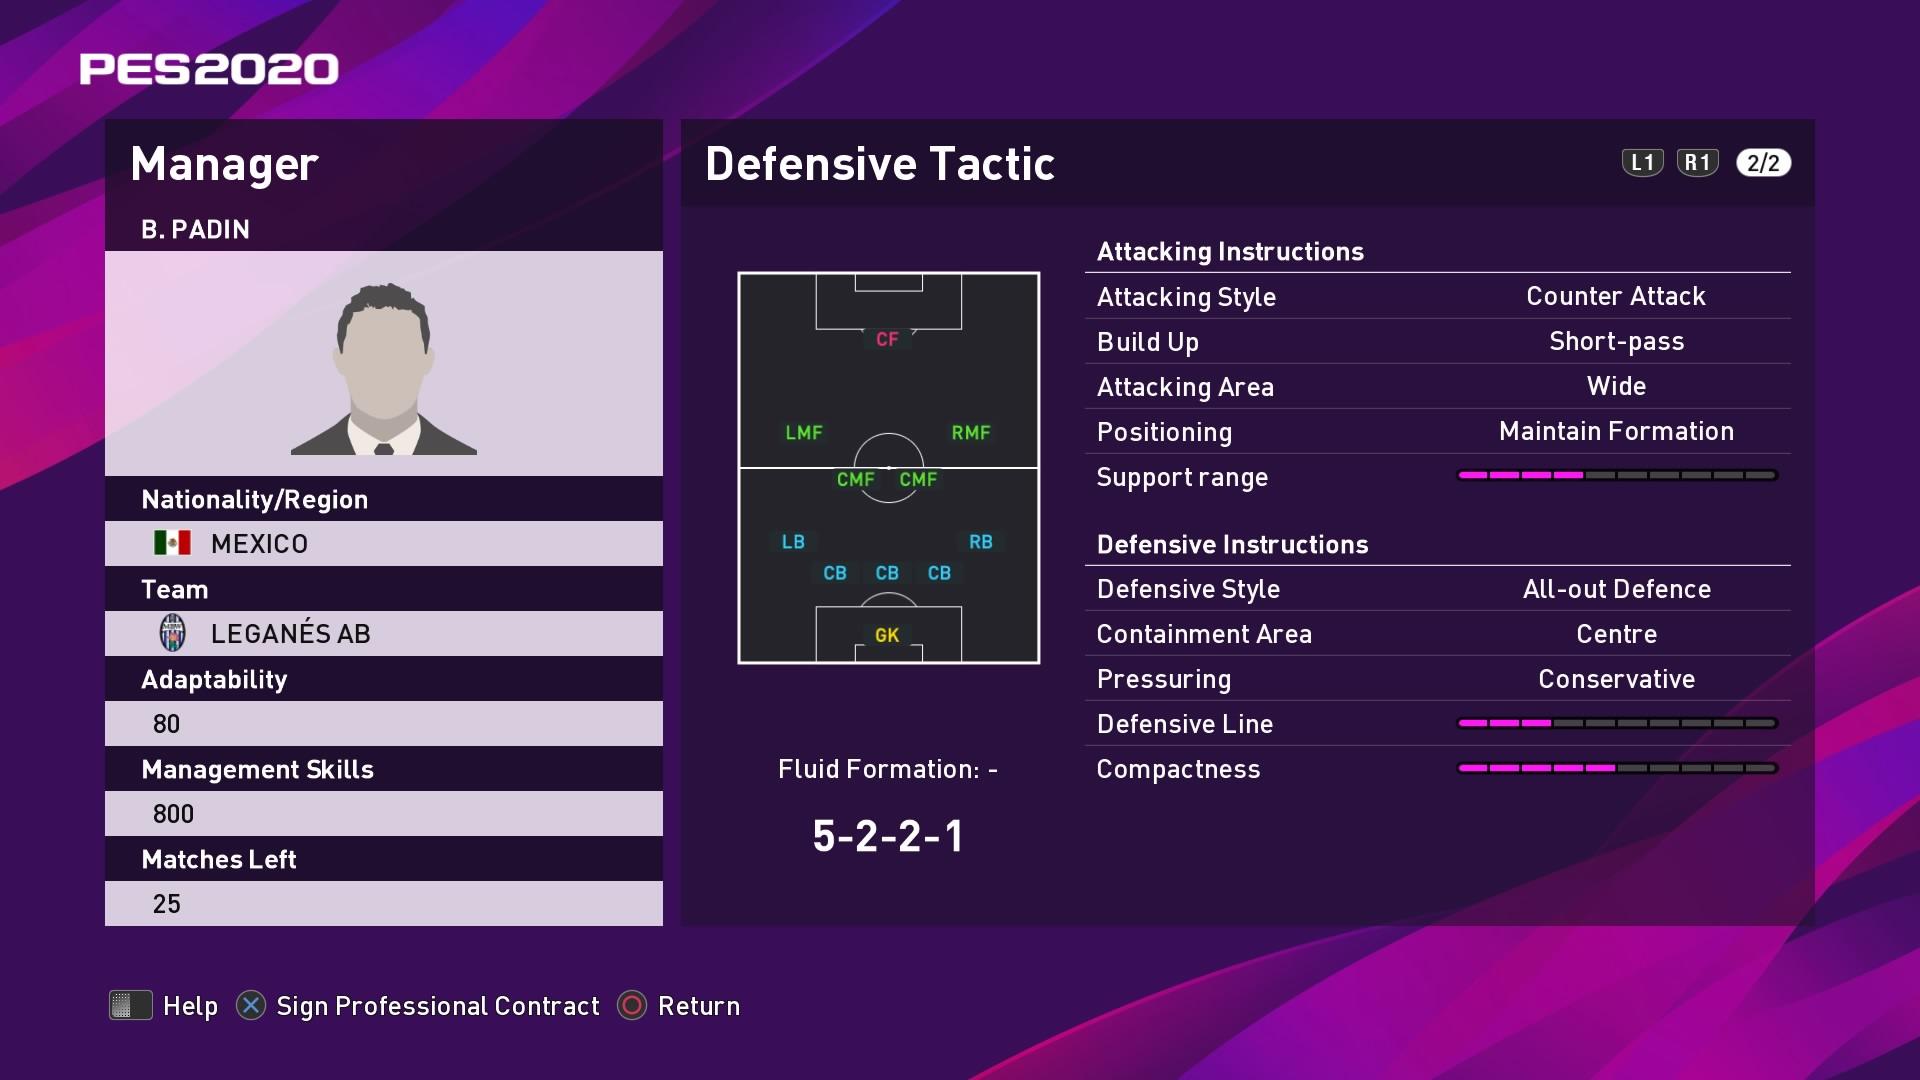 B. Padin (Javier Aguirre) Defensive Tactic in PES 2020 myClub